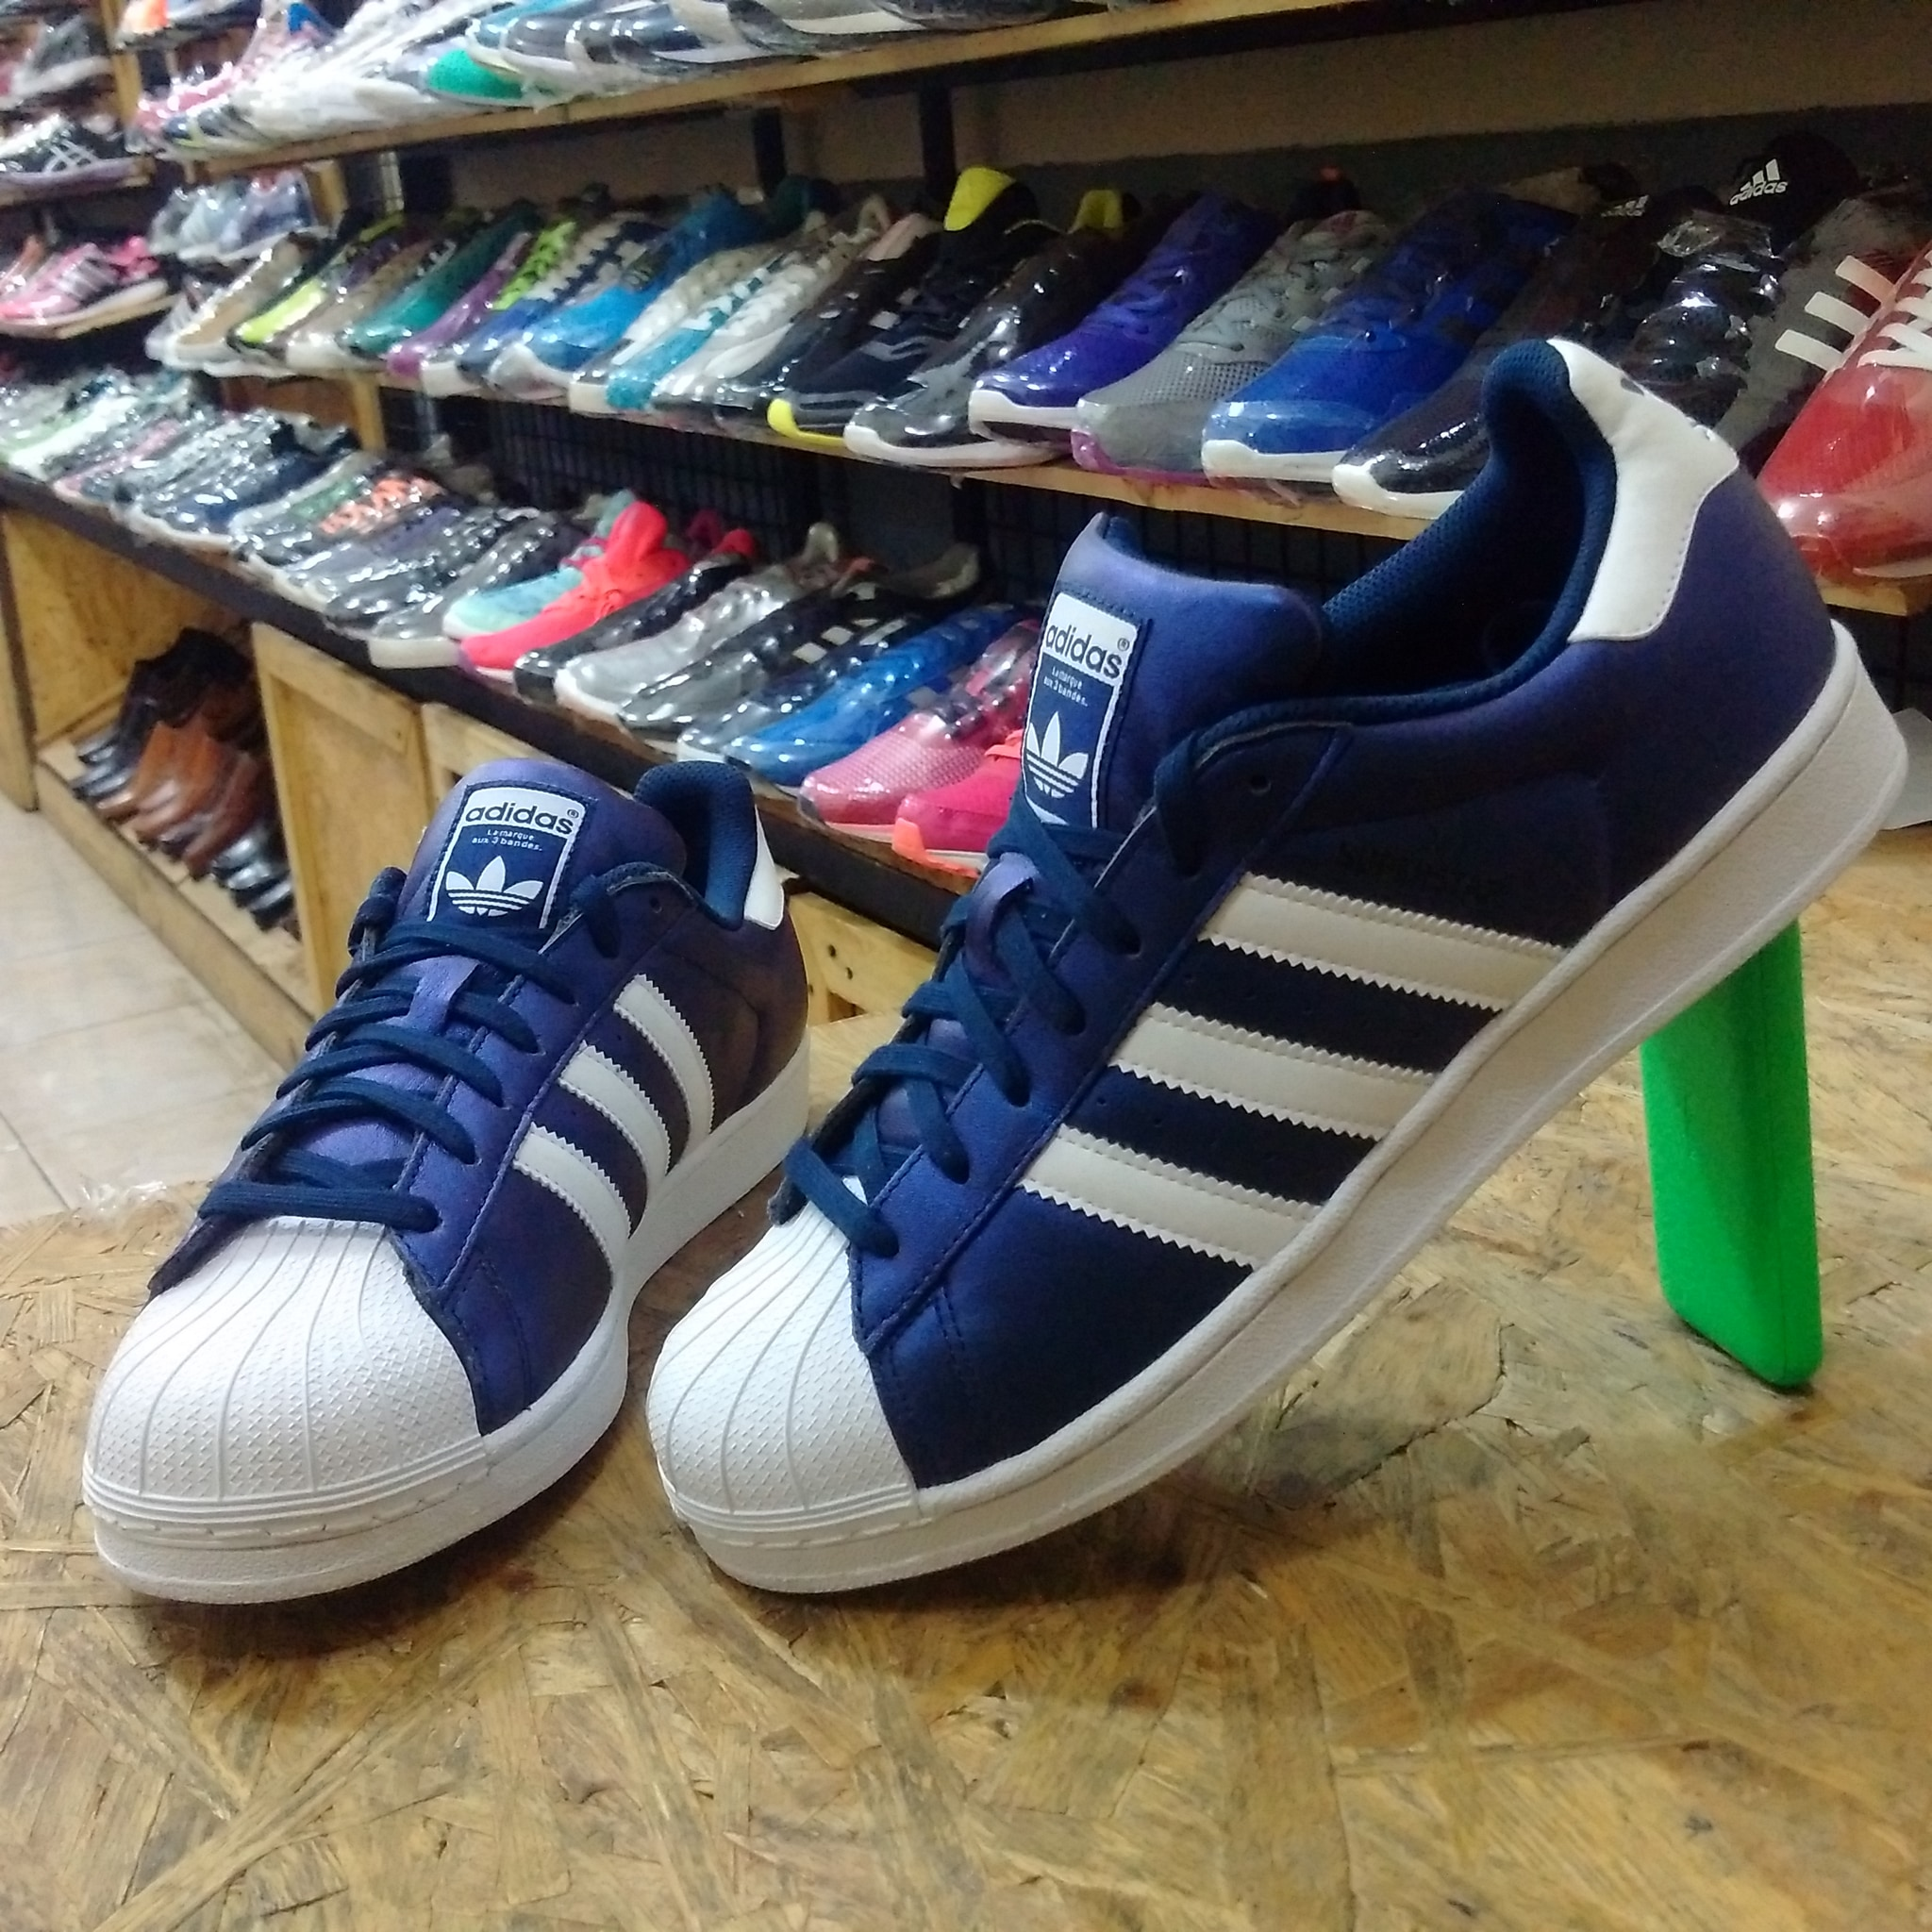 sepatu adidas superstar original Adidas Originals Basket Profi Womens  Sneakers Hi ... 15b17710787